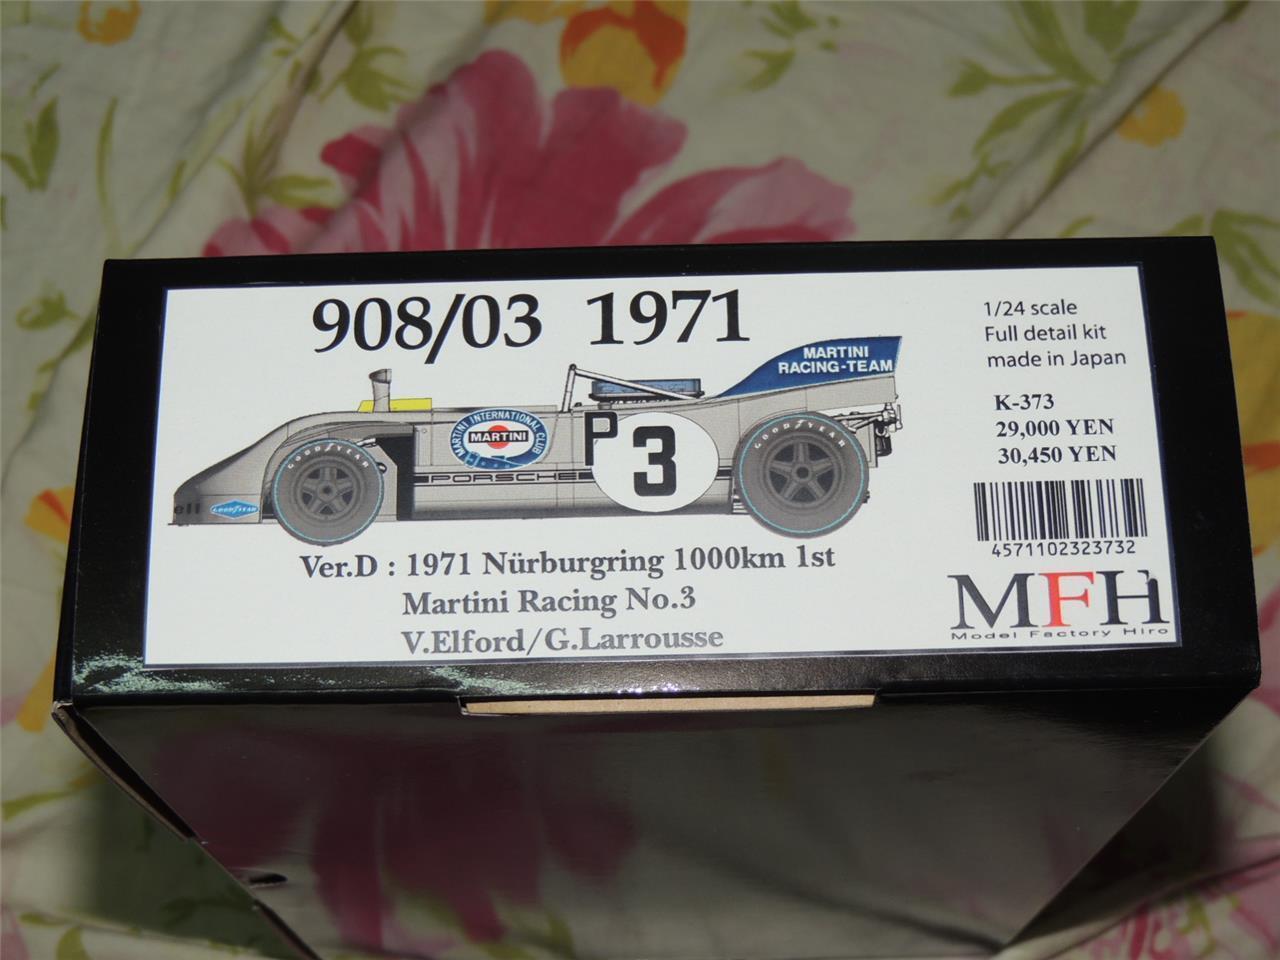 MODEL FACTORY HIRO MFH 1 24 PORSCHE 908 03 71' 71' 71' NURBURGRING SUPER DETAIL KIT K373 e0bc01